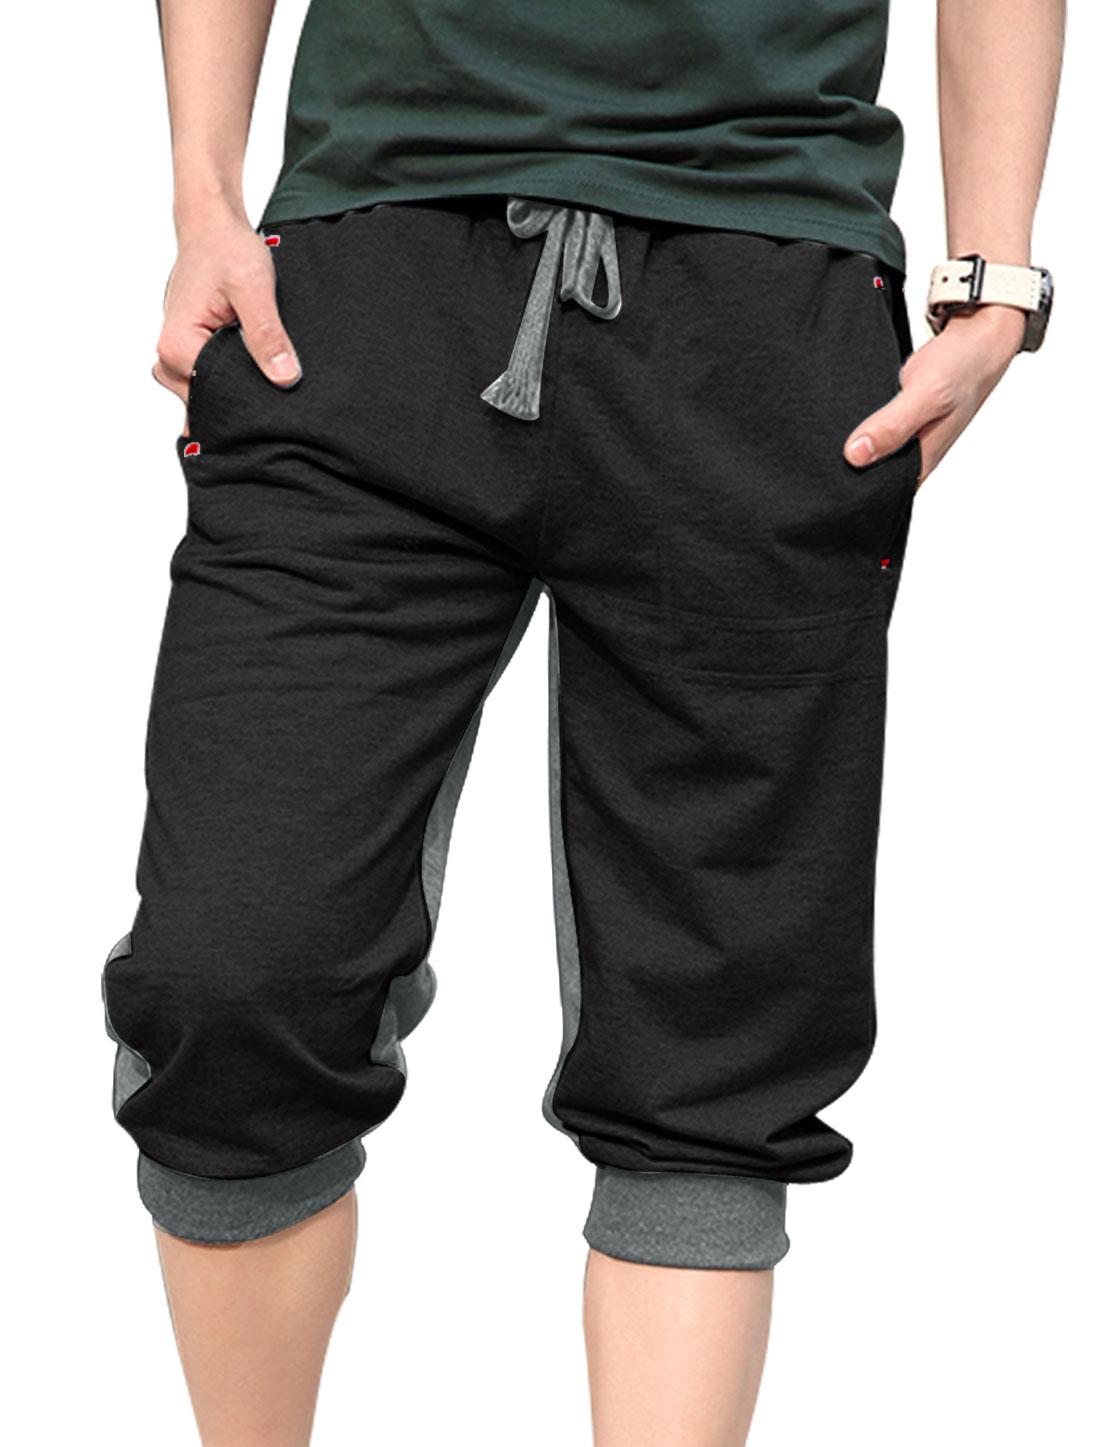 Men Elastic Drawstring Waist Side Pockets Fashion Capris Pants Black Gray W30